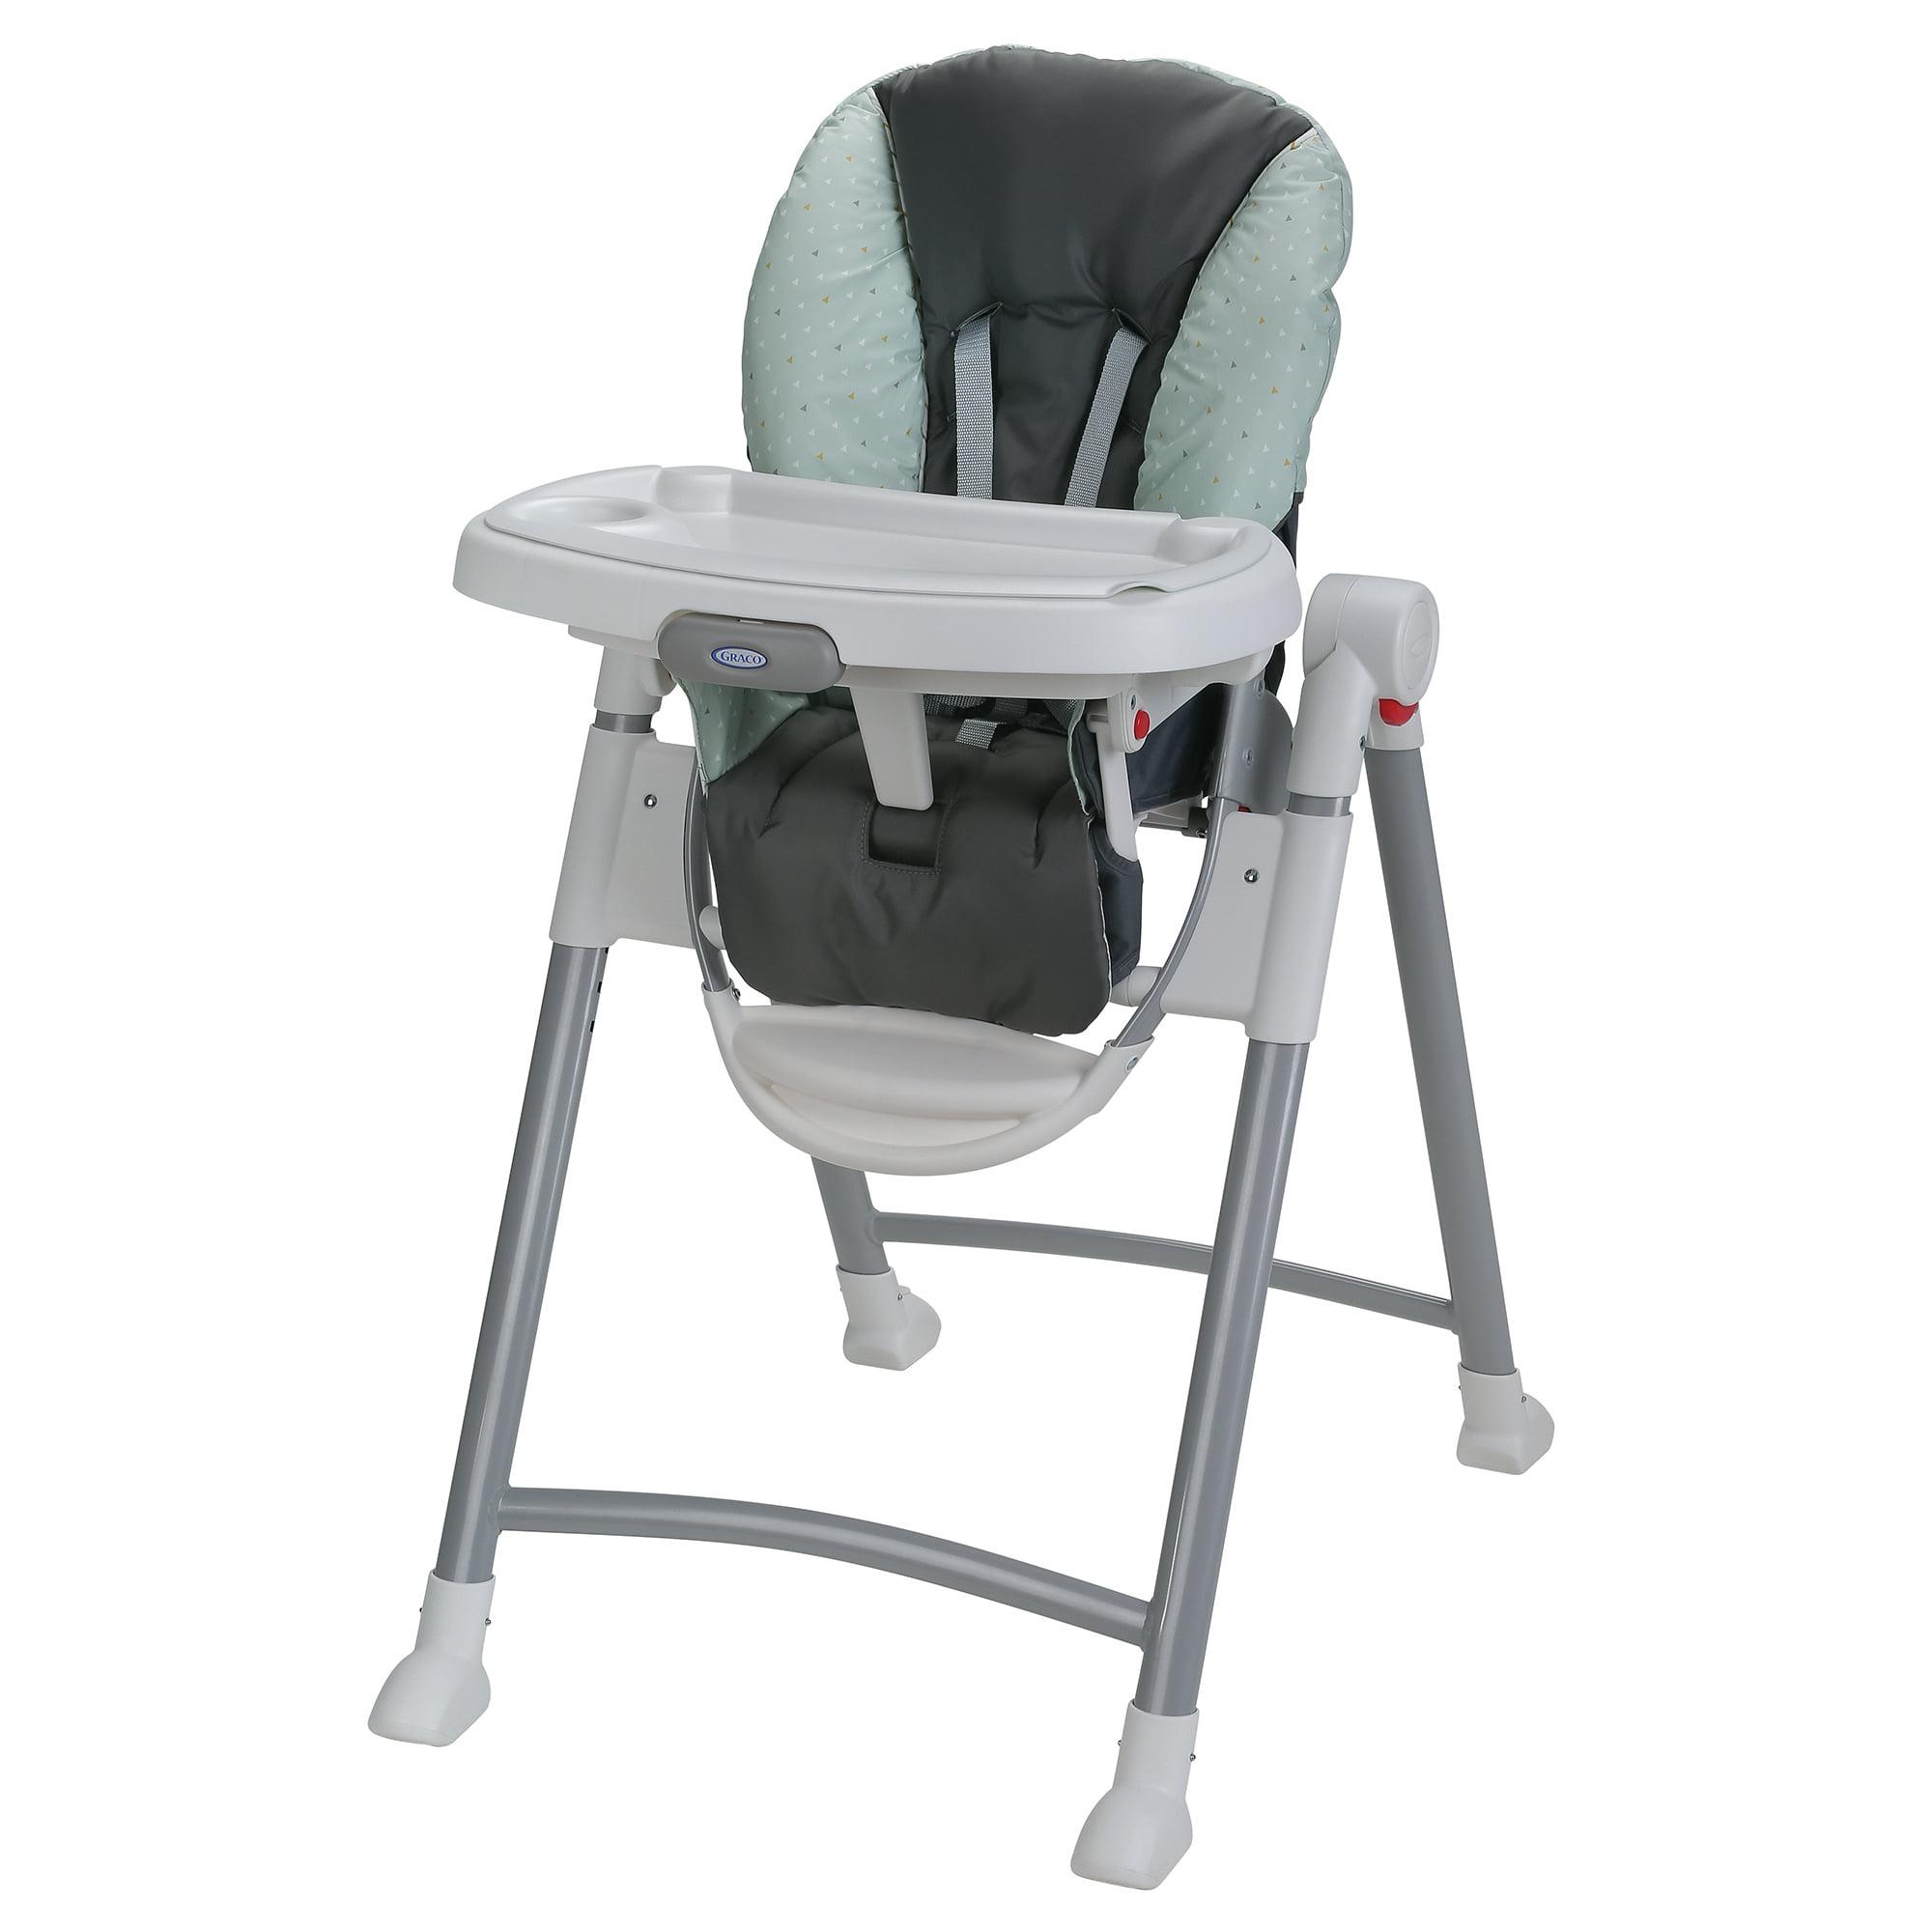 Graco Contempo Slim Folding High Chair, Bennett